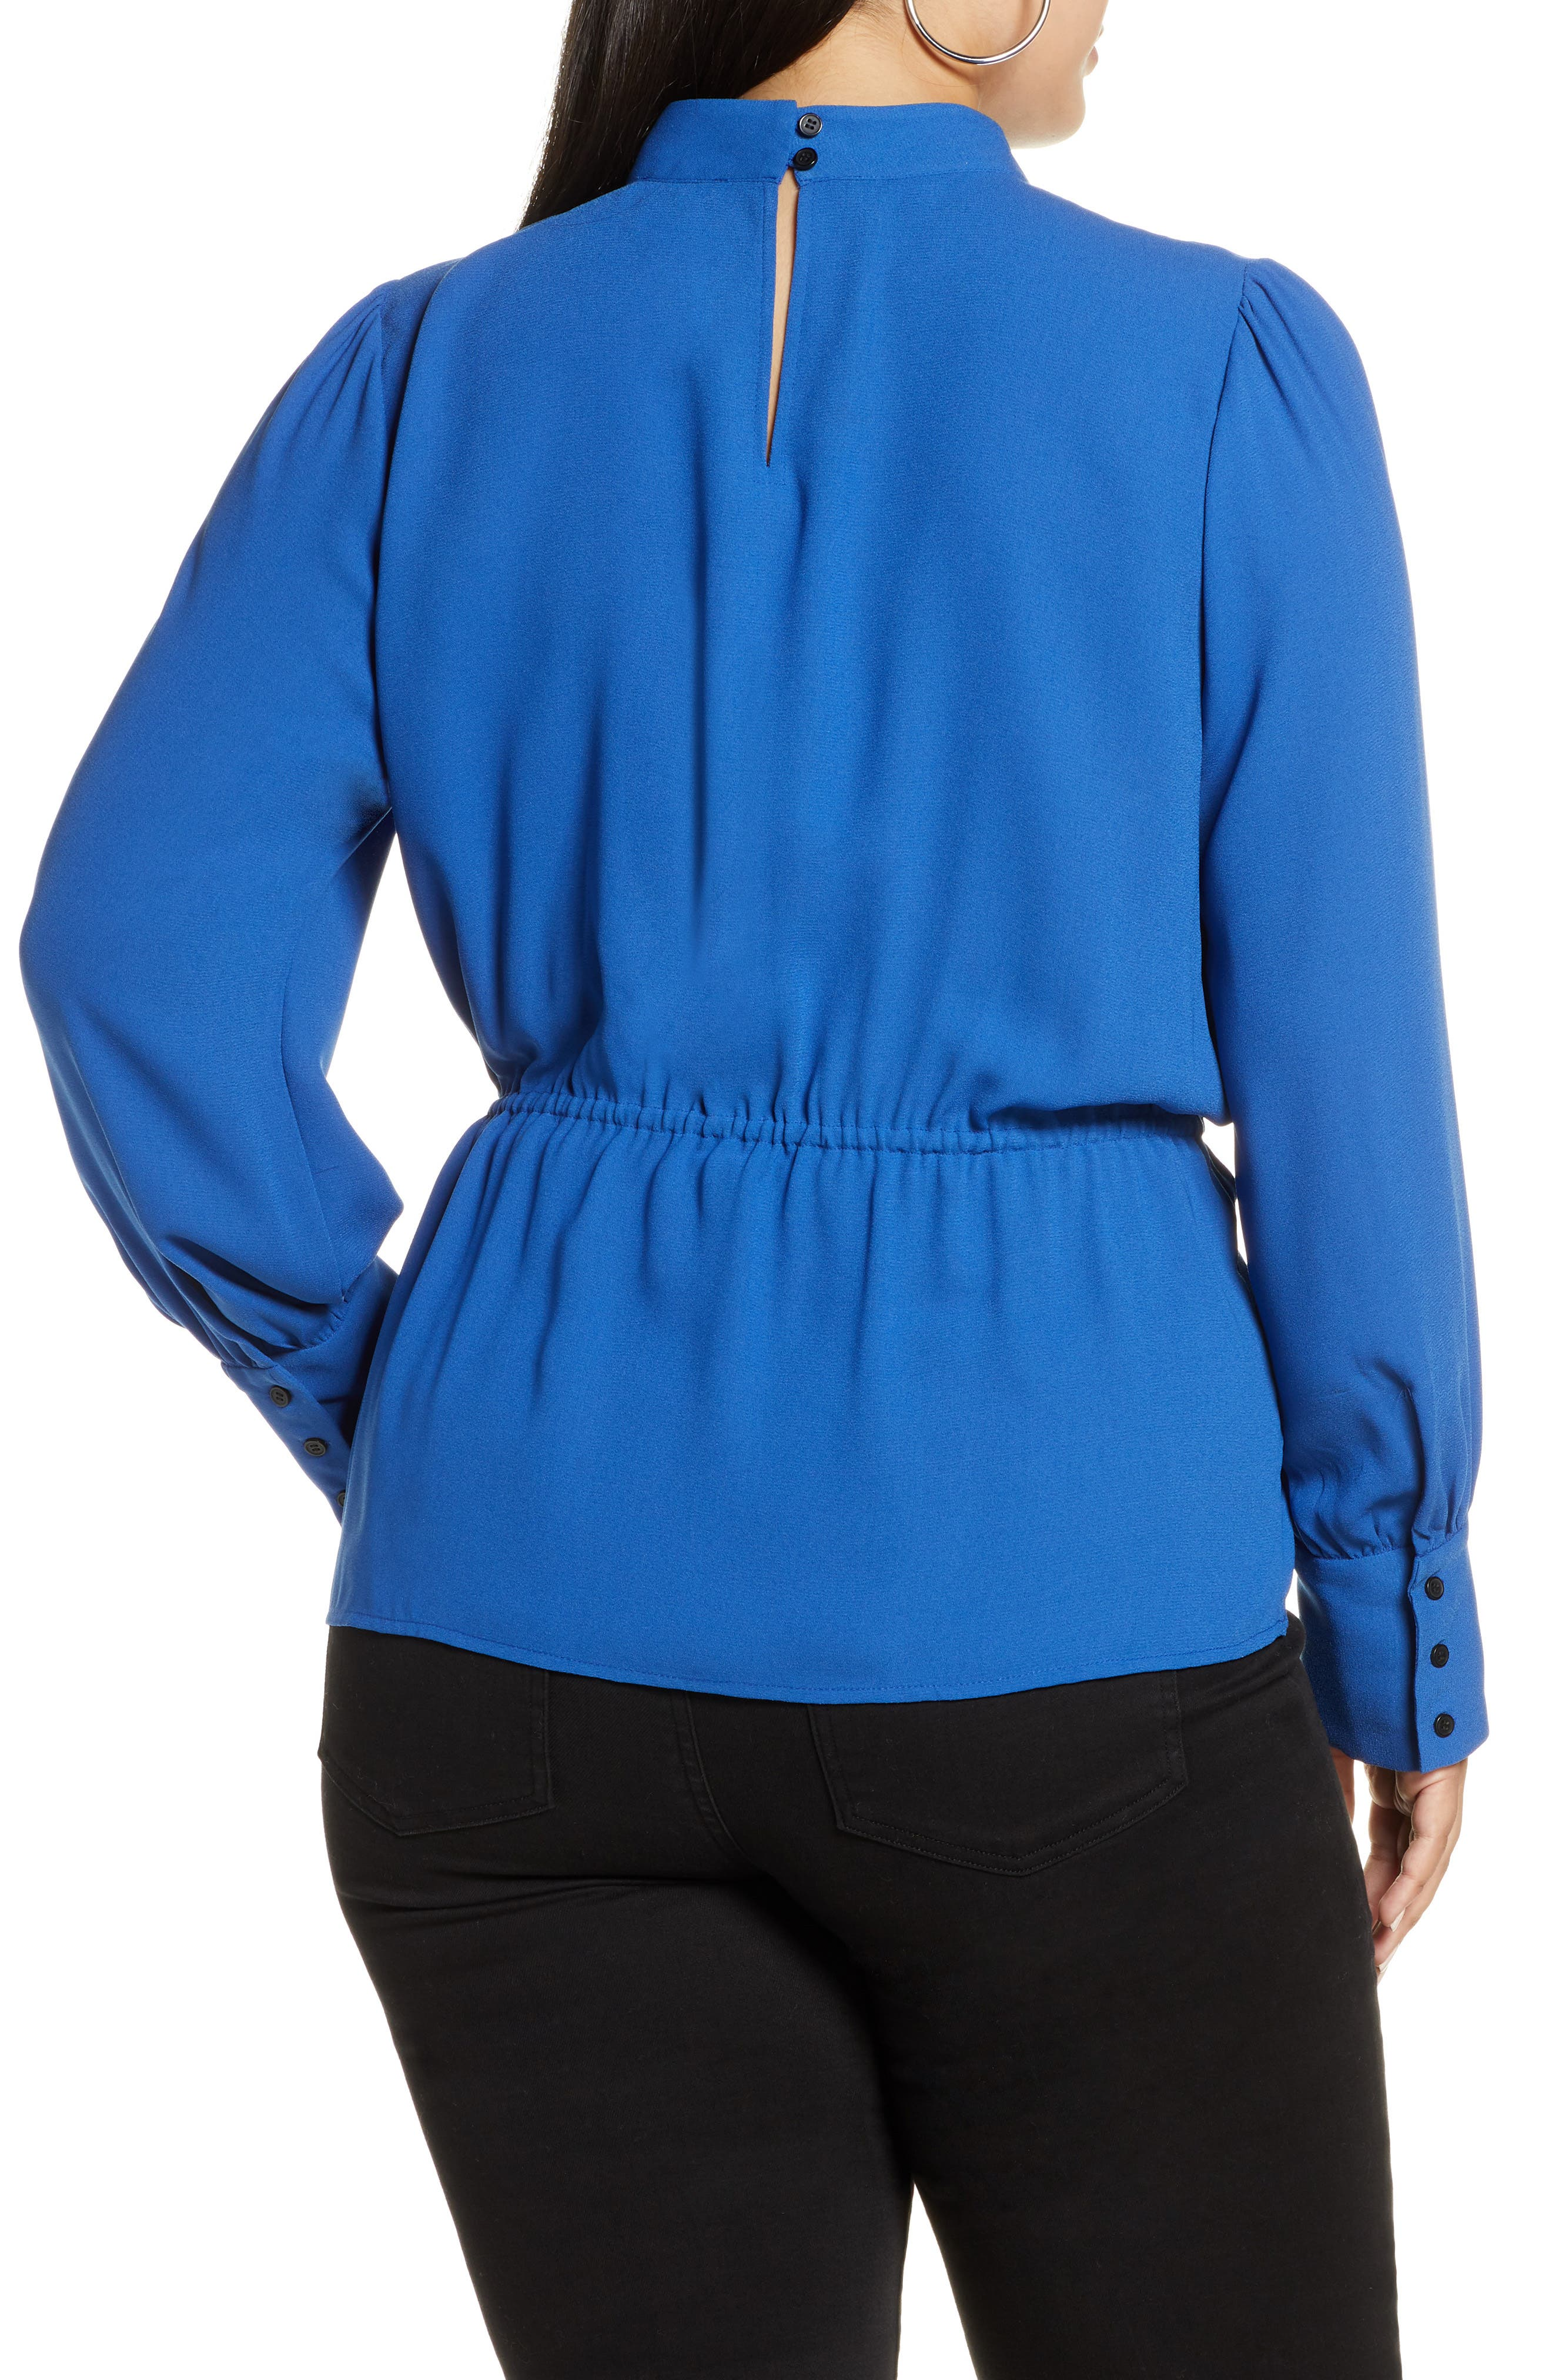 Women's Plus-Size Tops | Nordstrom